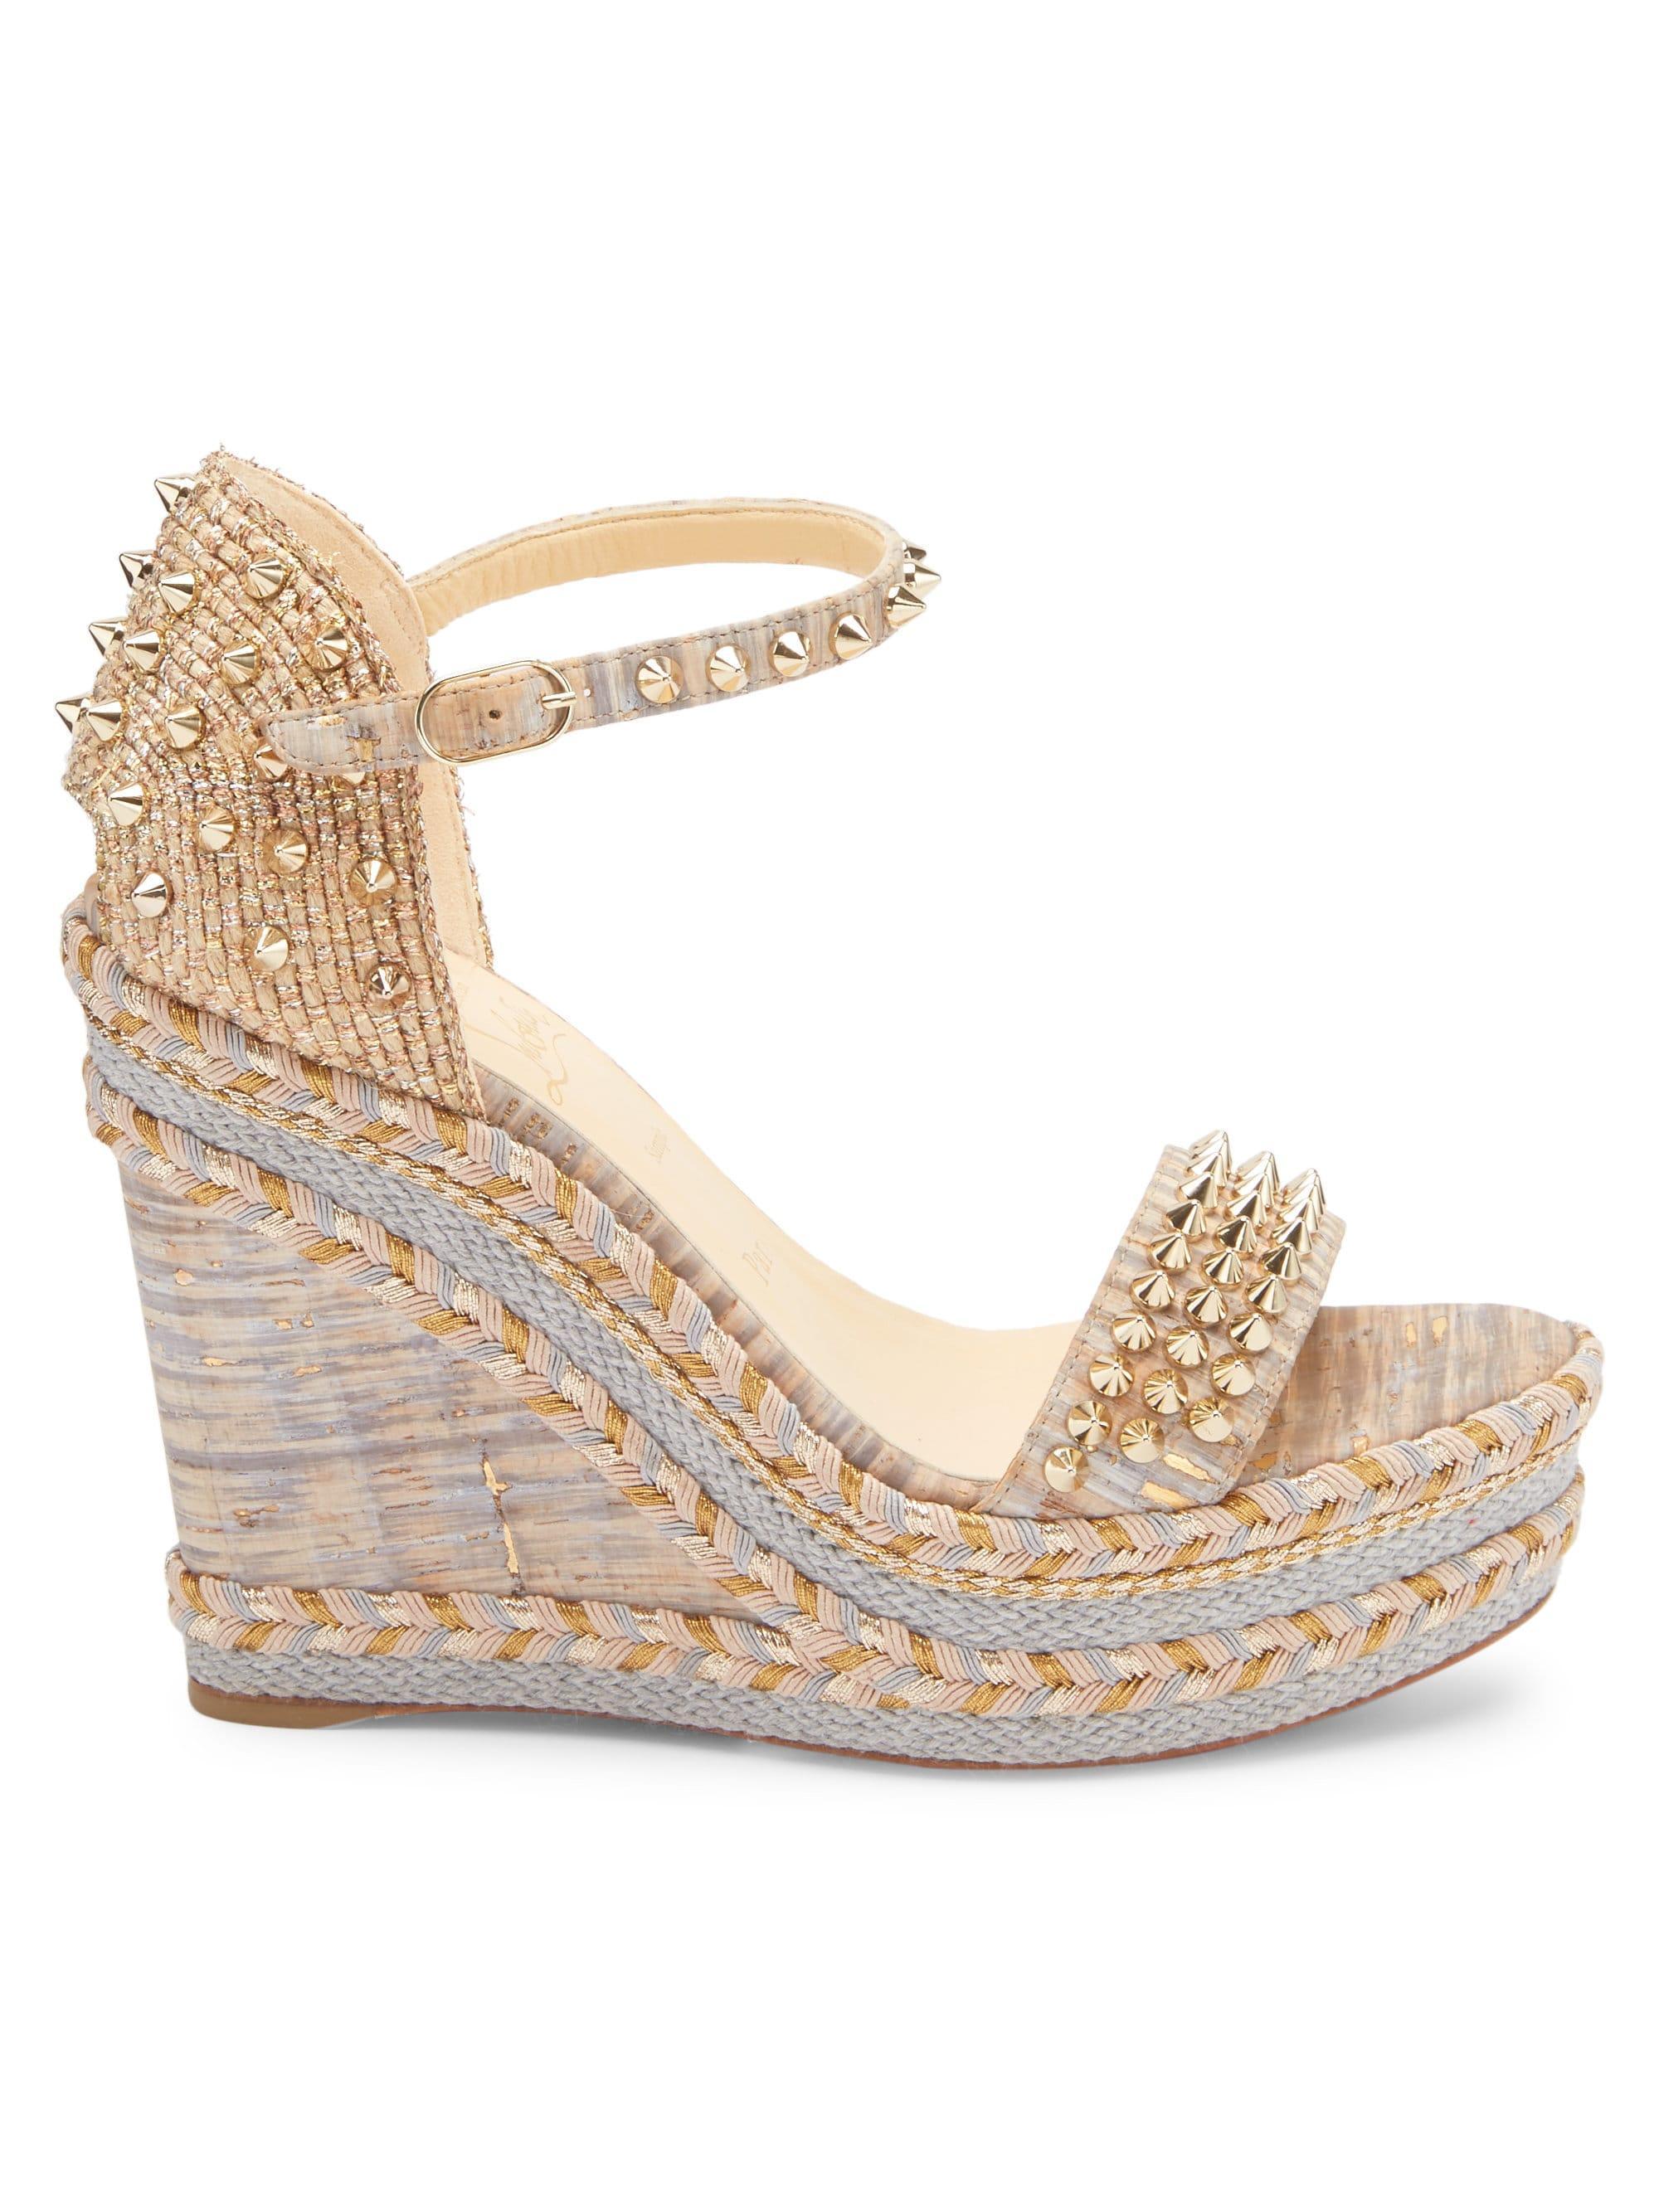 1dceb0cf6d5 Christian Louboutin Multicolor Women's Mad Monica 120 Platform Wedge  Sandals - Tan